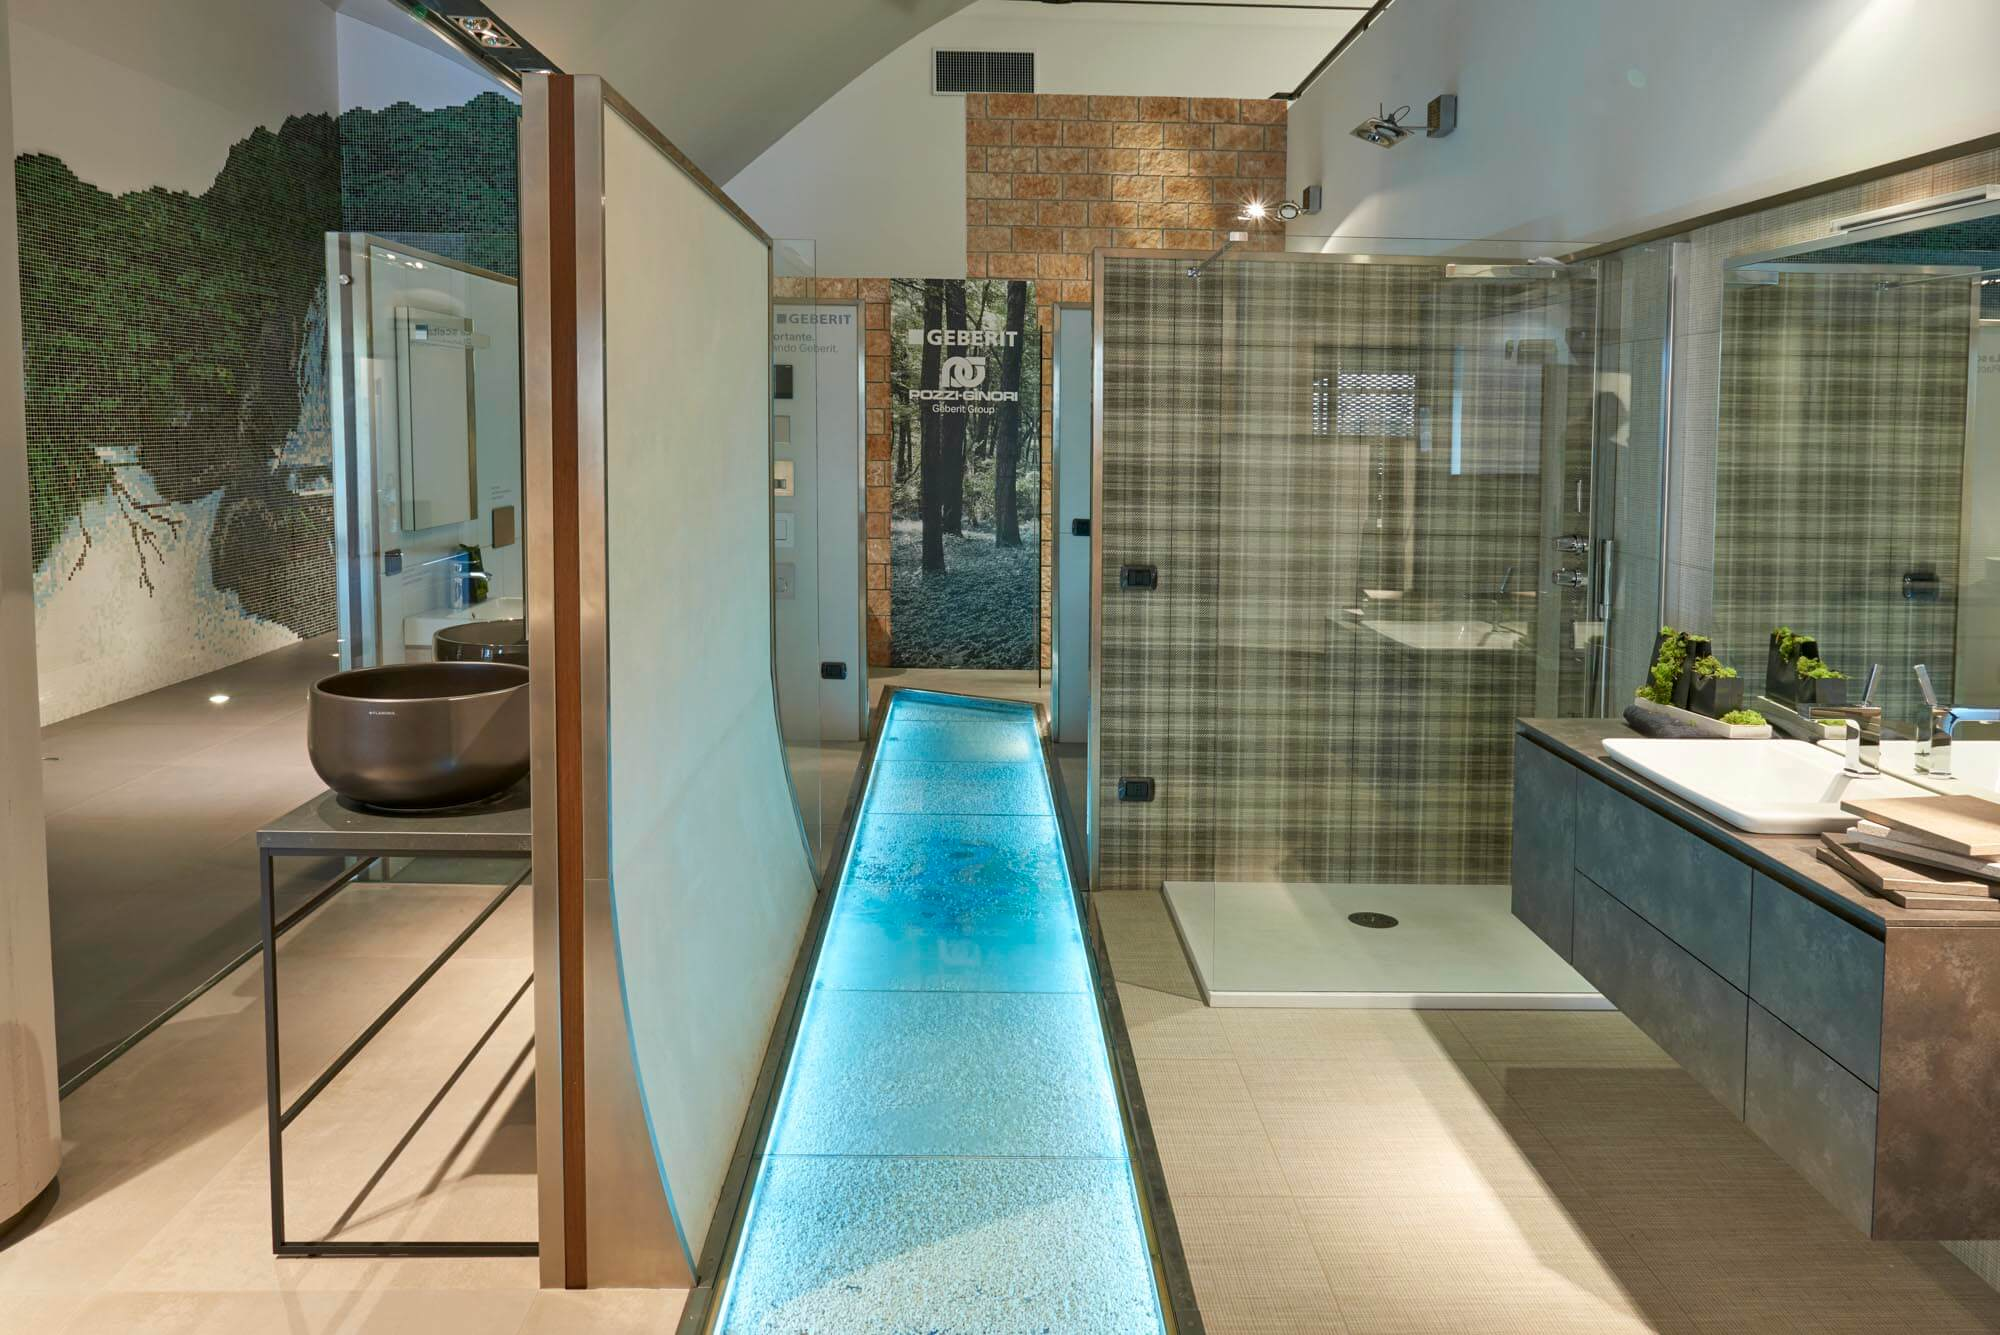 Showroom SVAI_Caselle pavimento acqua